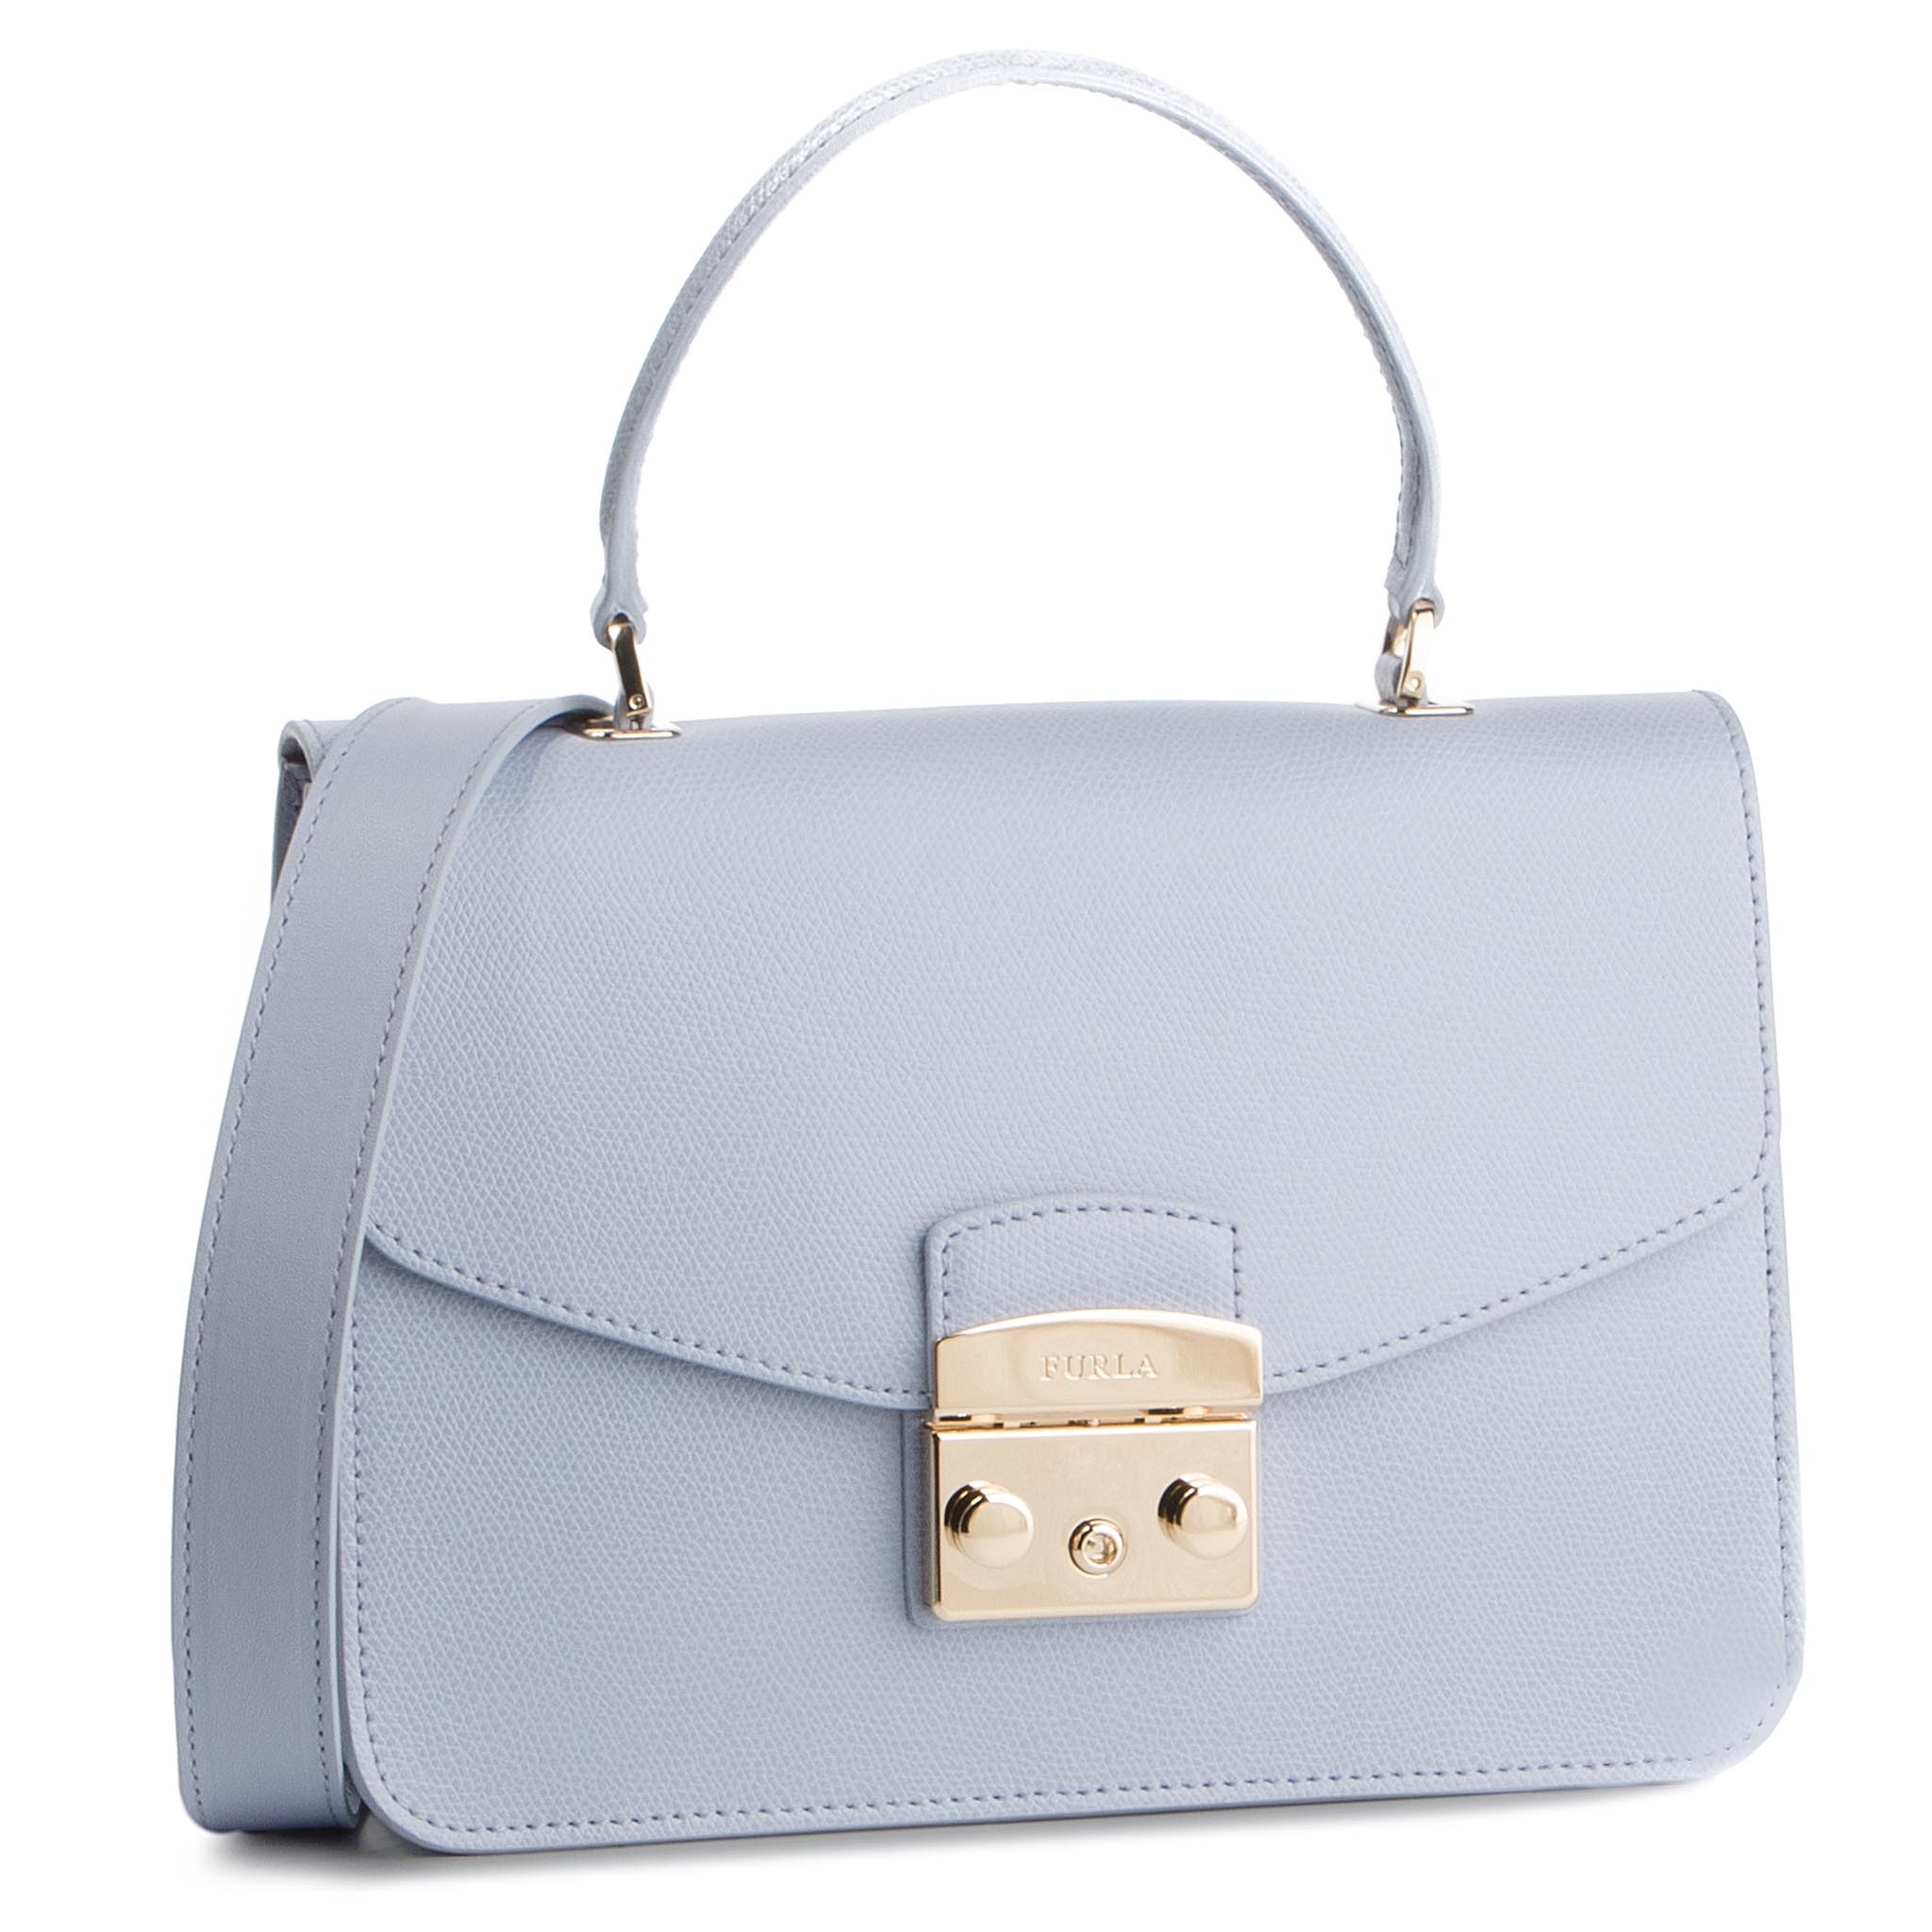 bab34e7b5f59e Handbag FURLA - Metropolis 978122 B BLE8 ARE Lavanda e - Classic ...